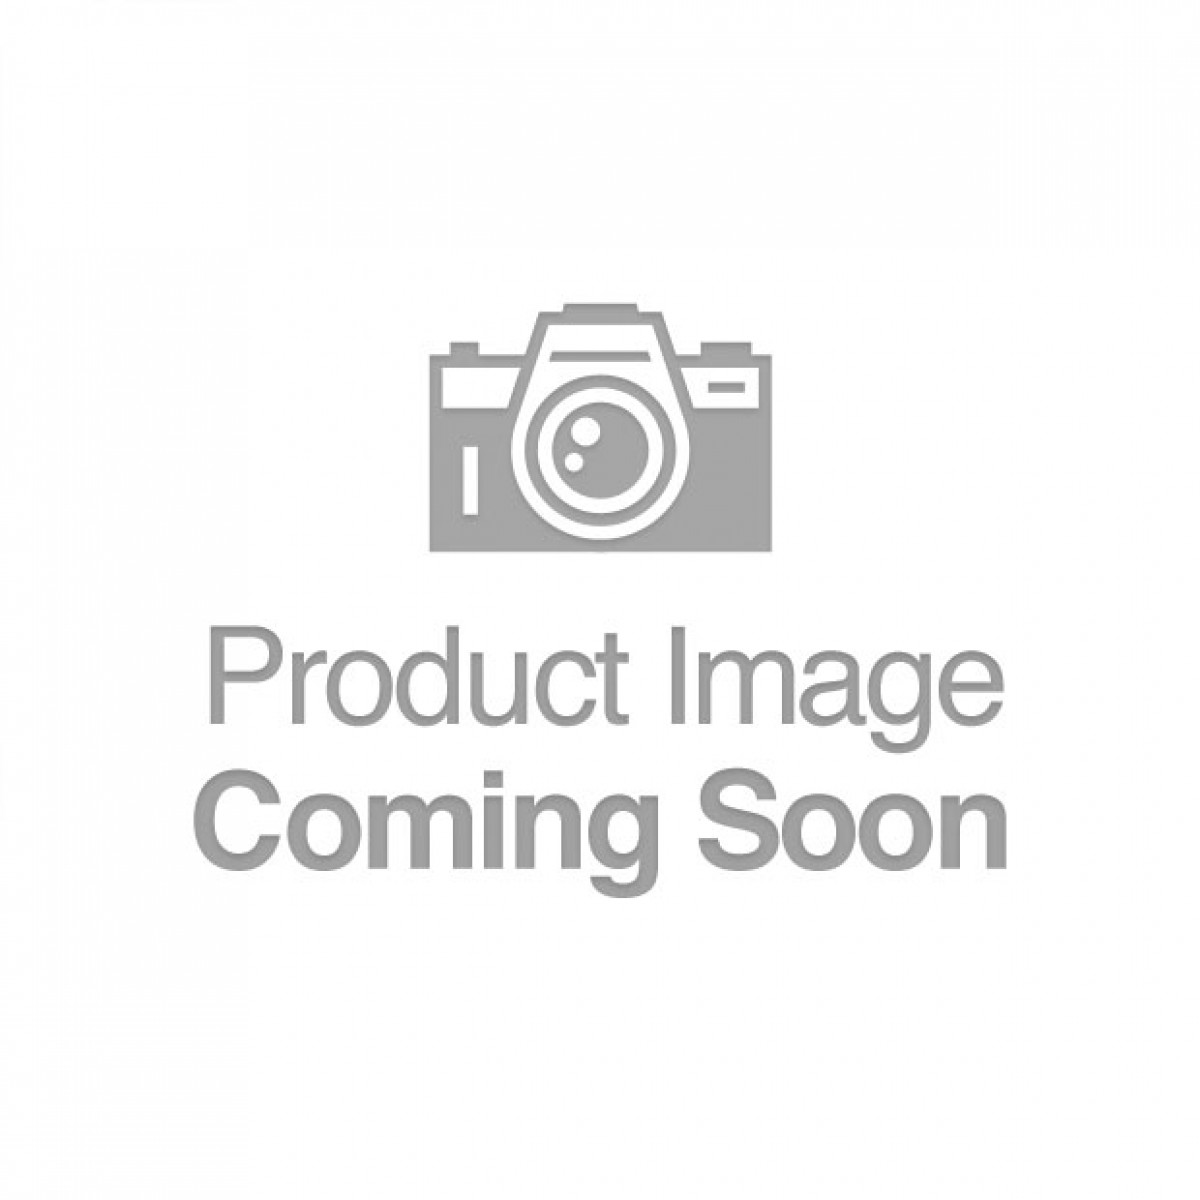 Dorcel Multi Joy Bendable Stimulator - Black